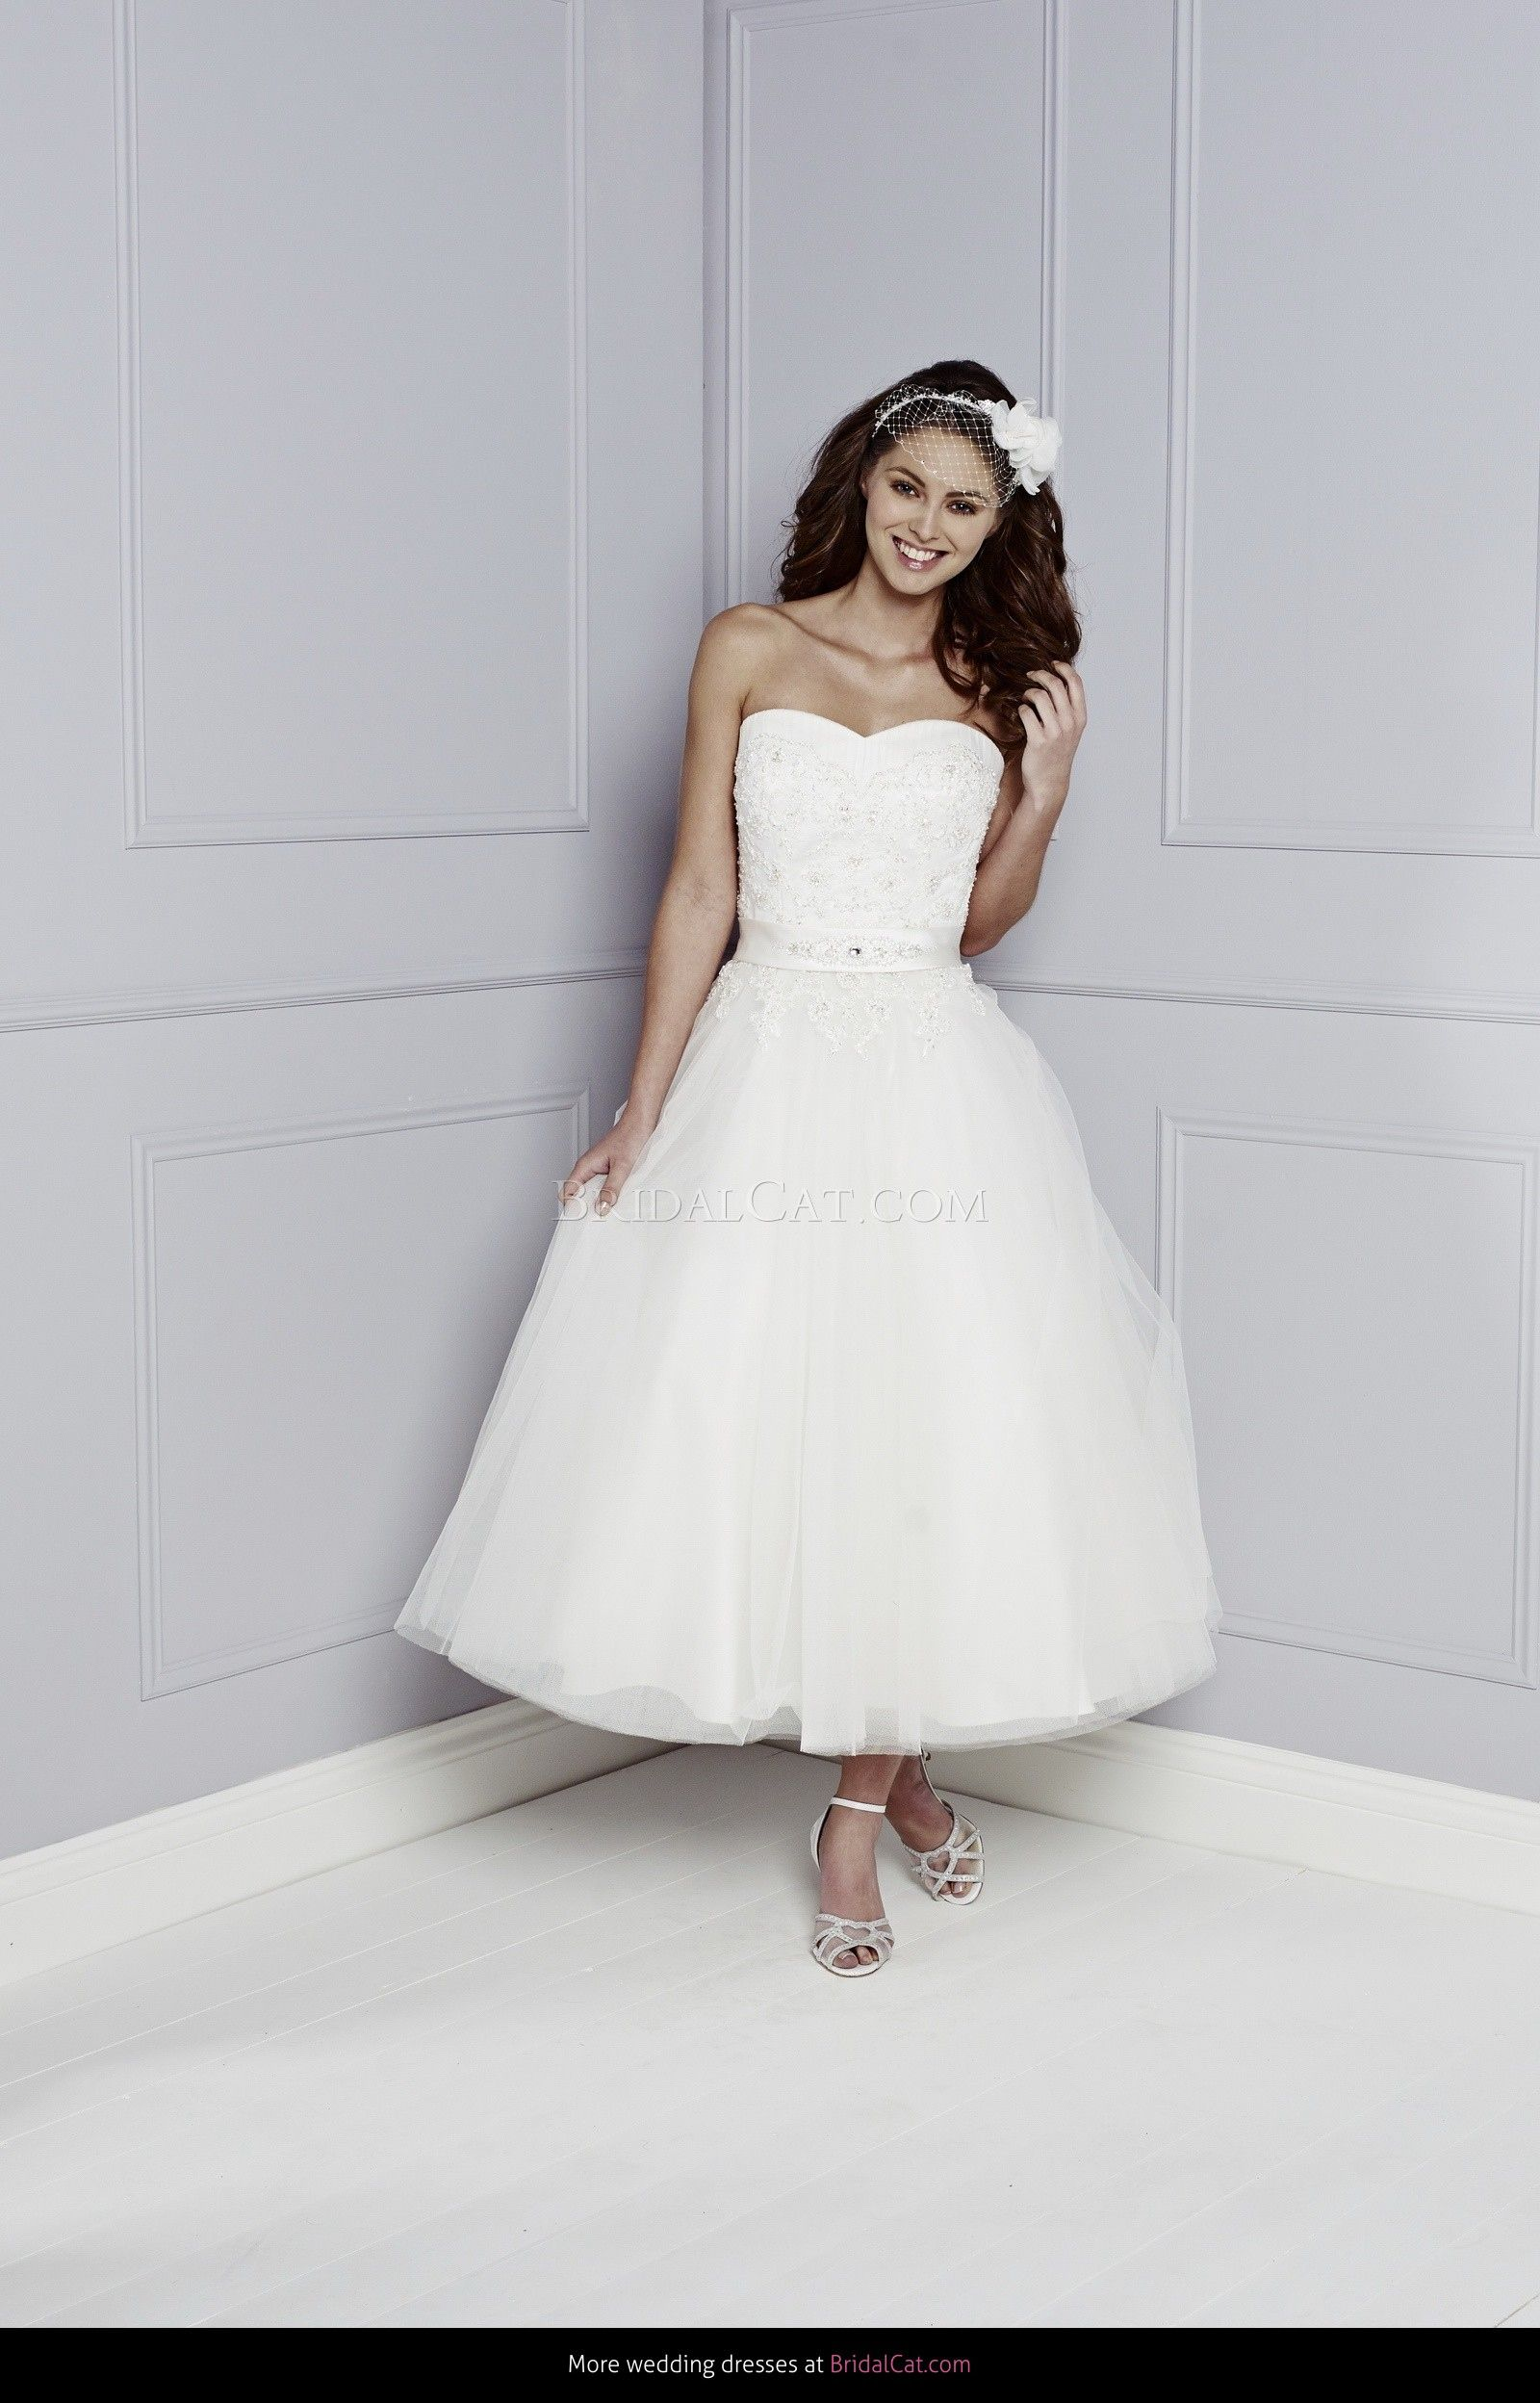 Vintage wedding tea dress  Bargain Price Vintage Style Tea Length Wedding Dress for sale ONLY